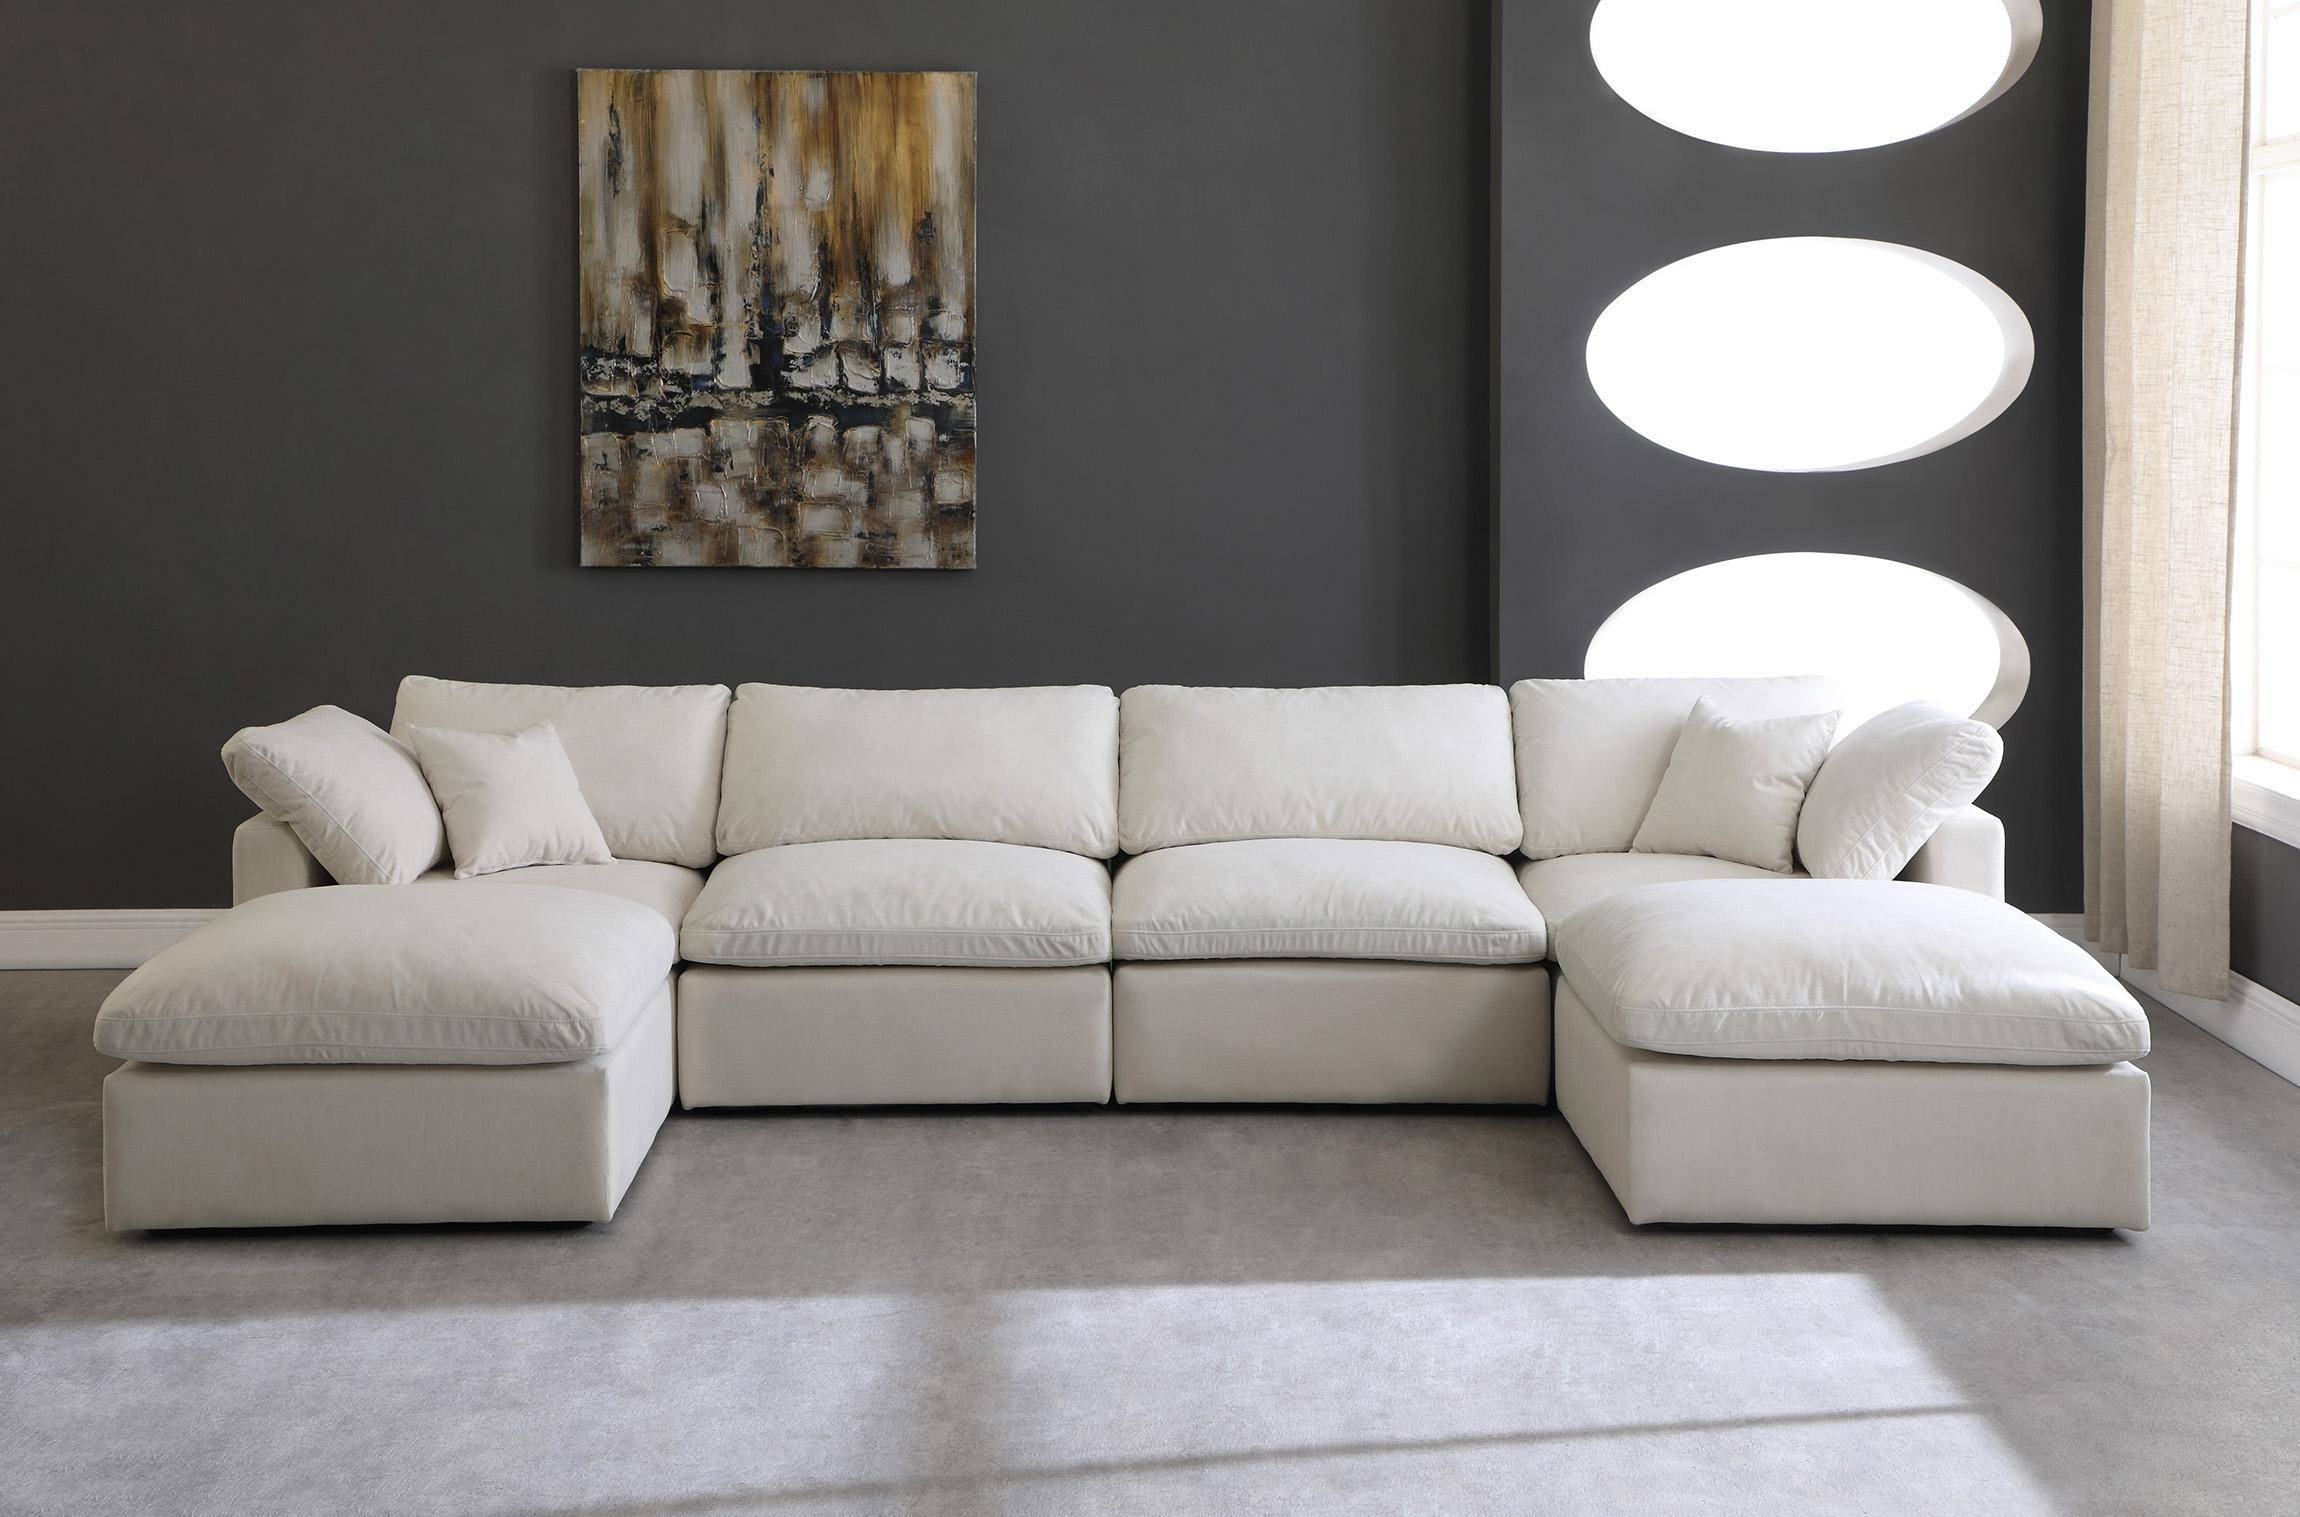 meridian cloud cream modular sectional sofa in cream fabric